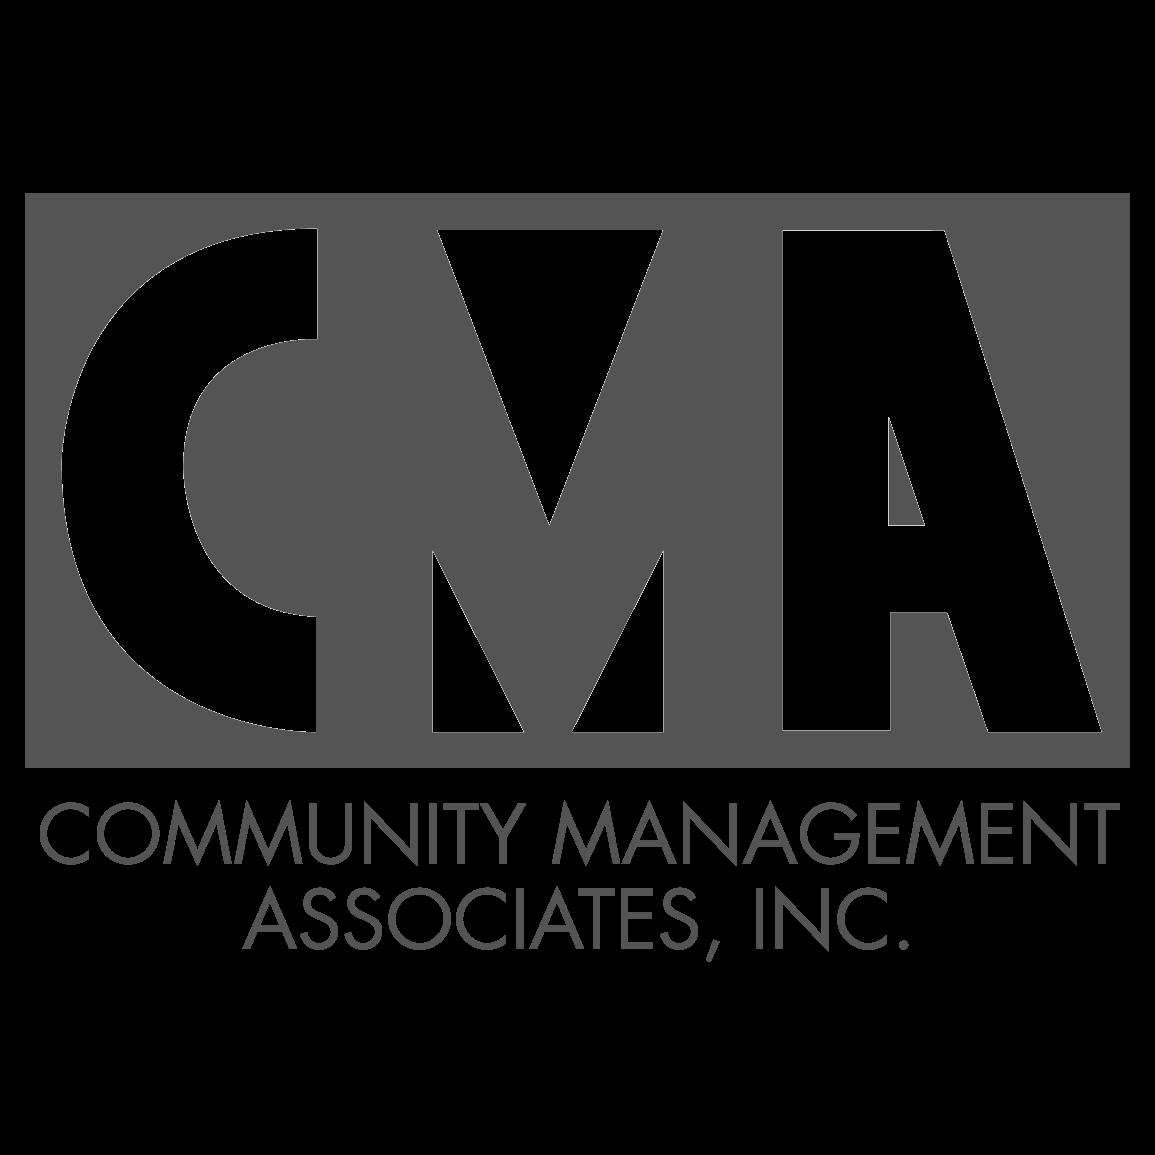 logo-cma-square.png